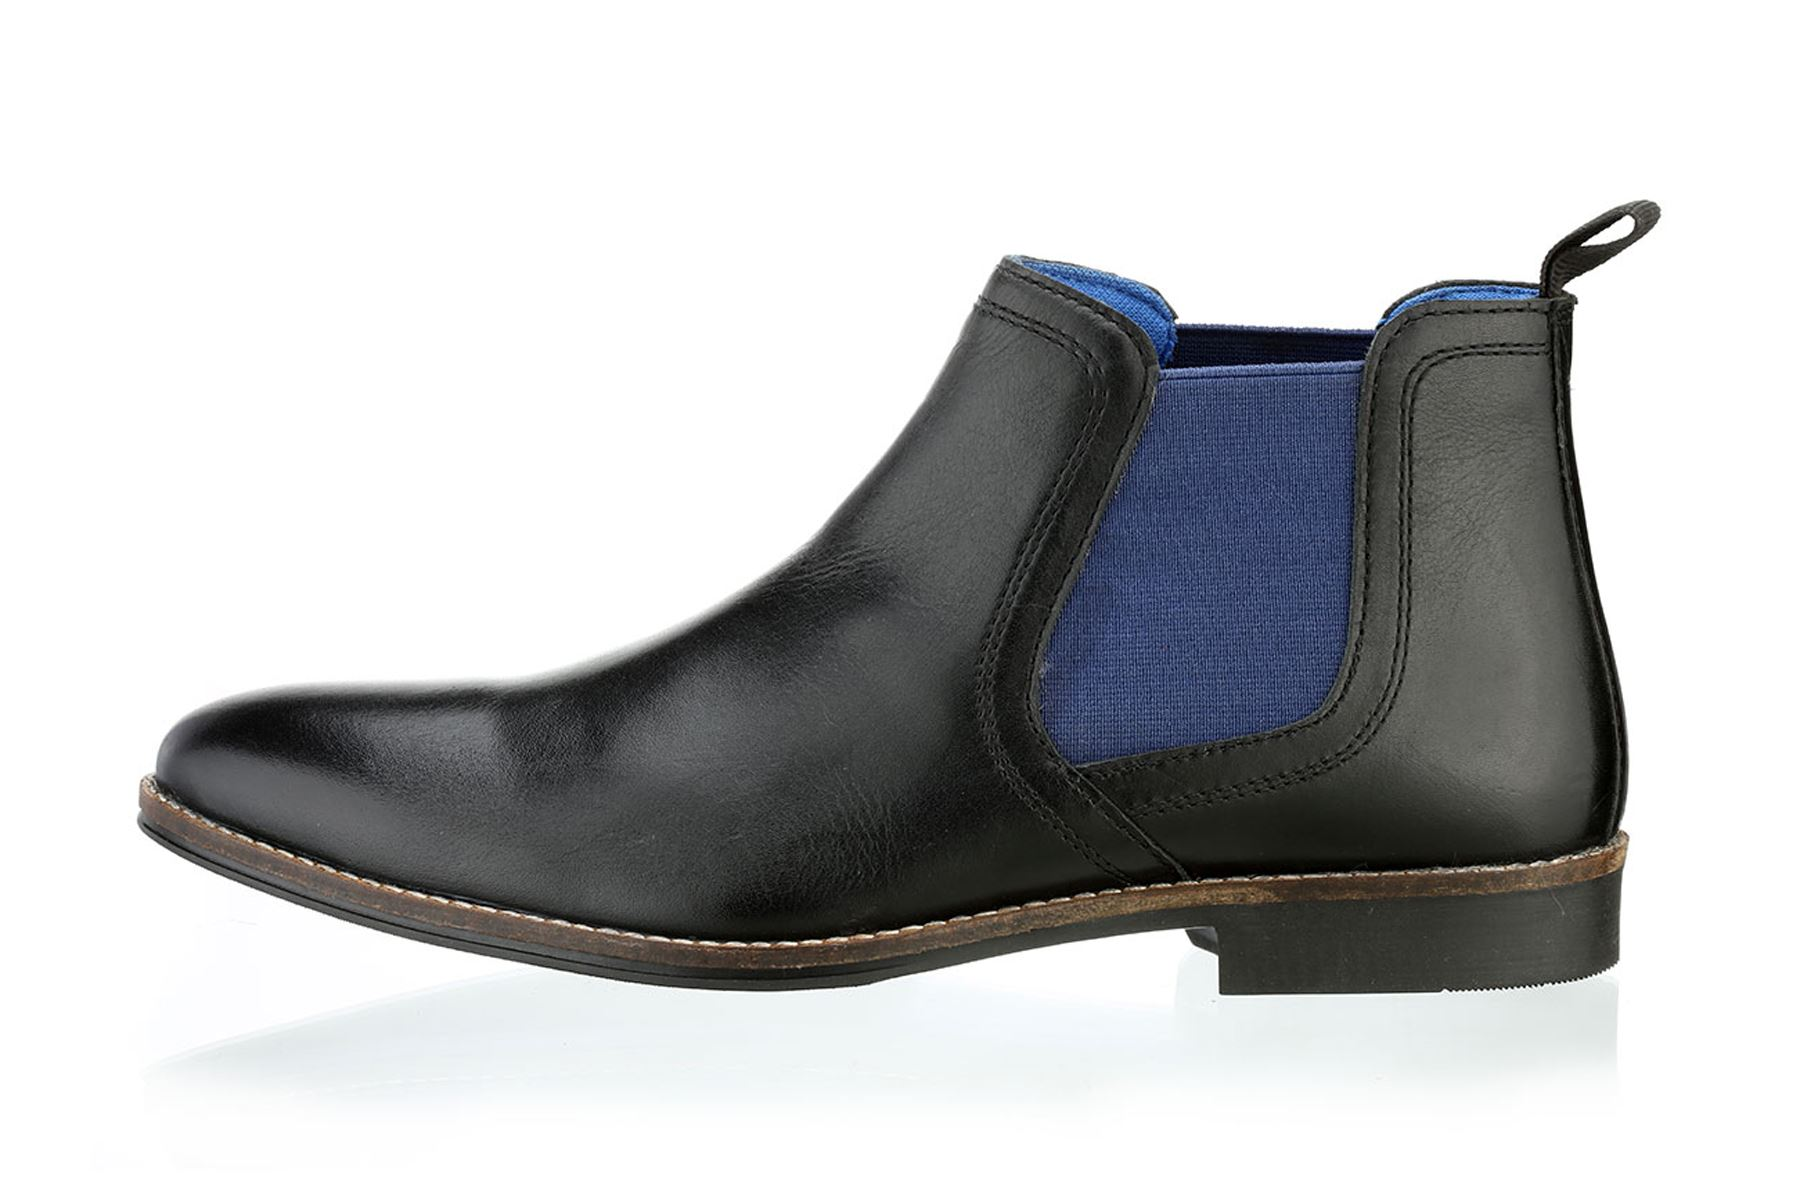 Stockwood, Botas Chelsea para Hombre, Color Negro (Black Leather/Blue), Talla 42 EU Redtape